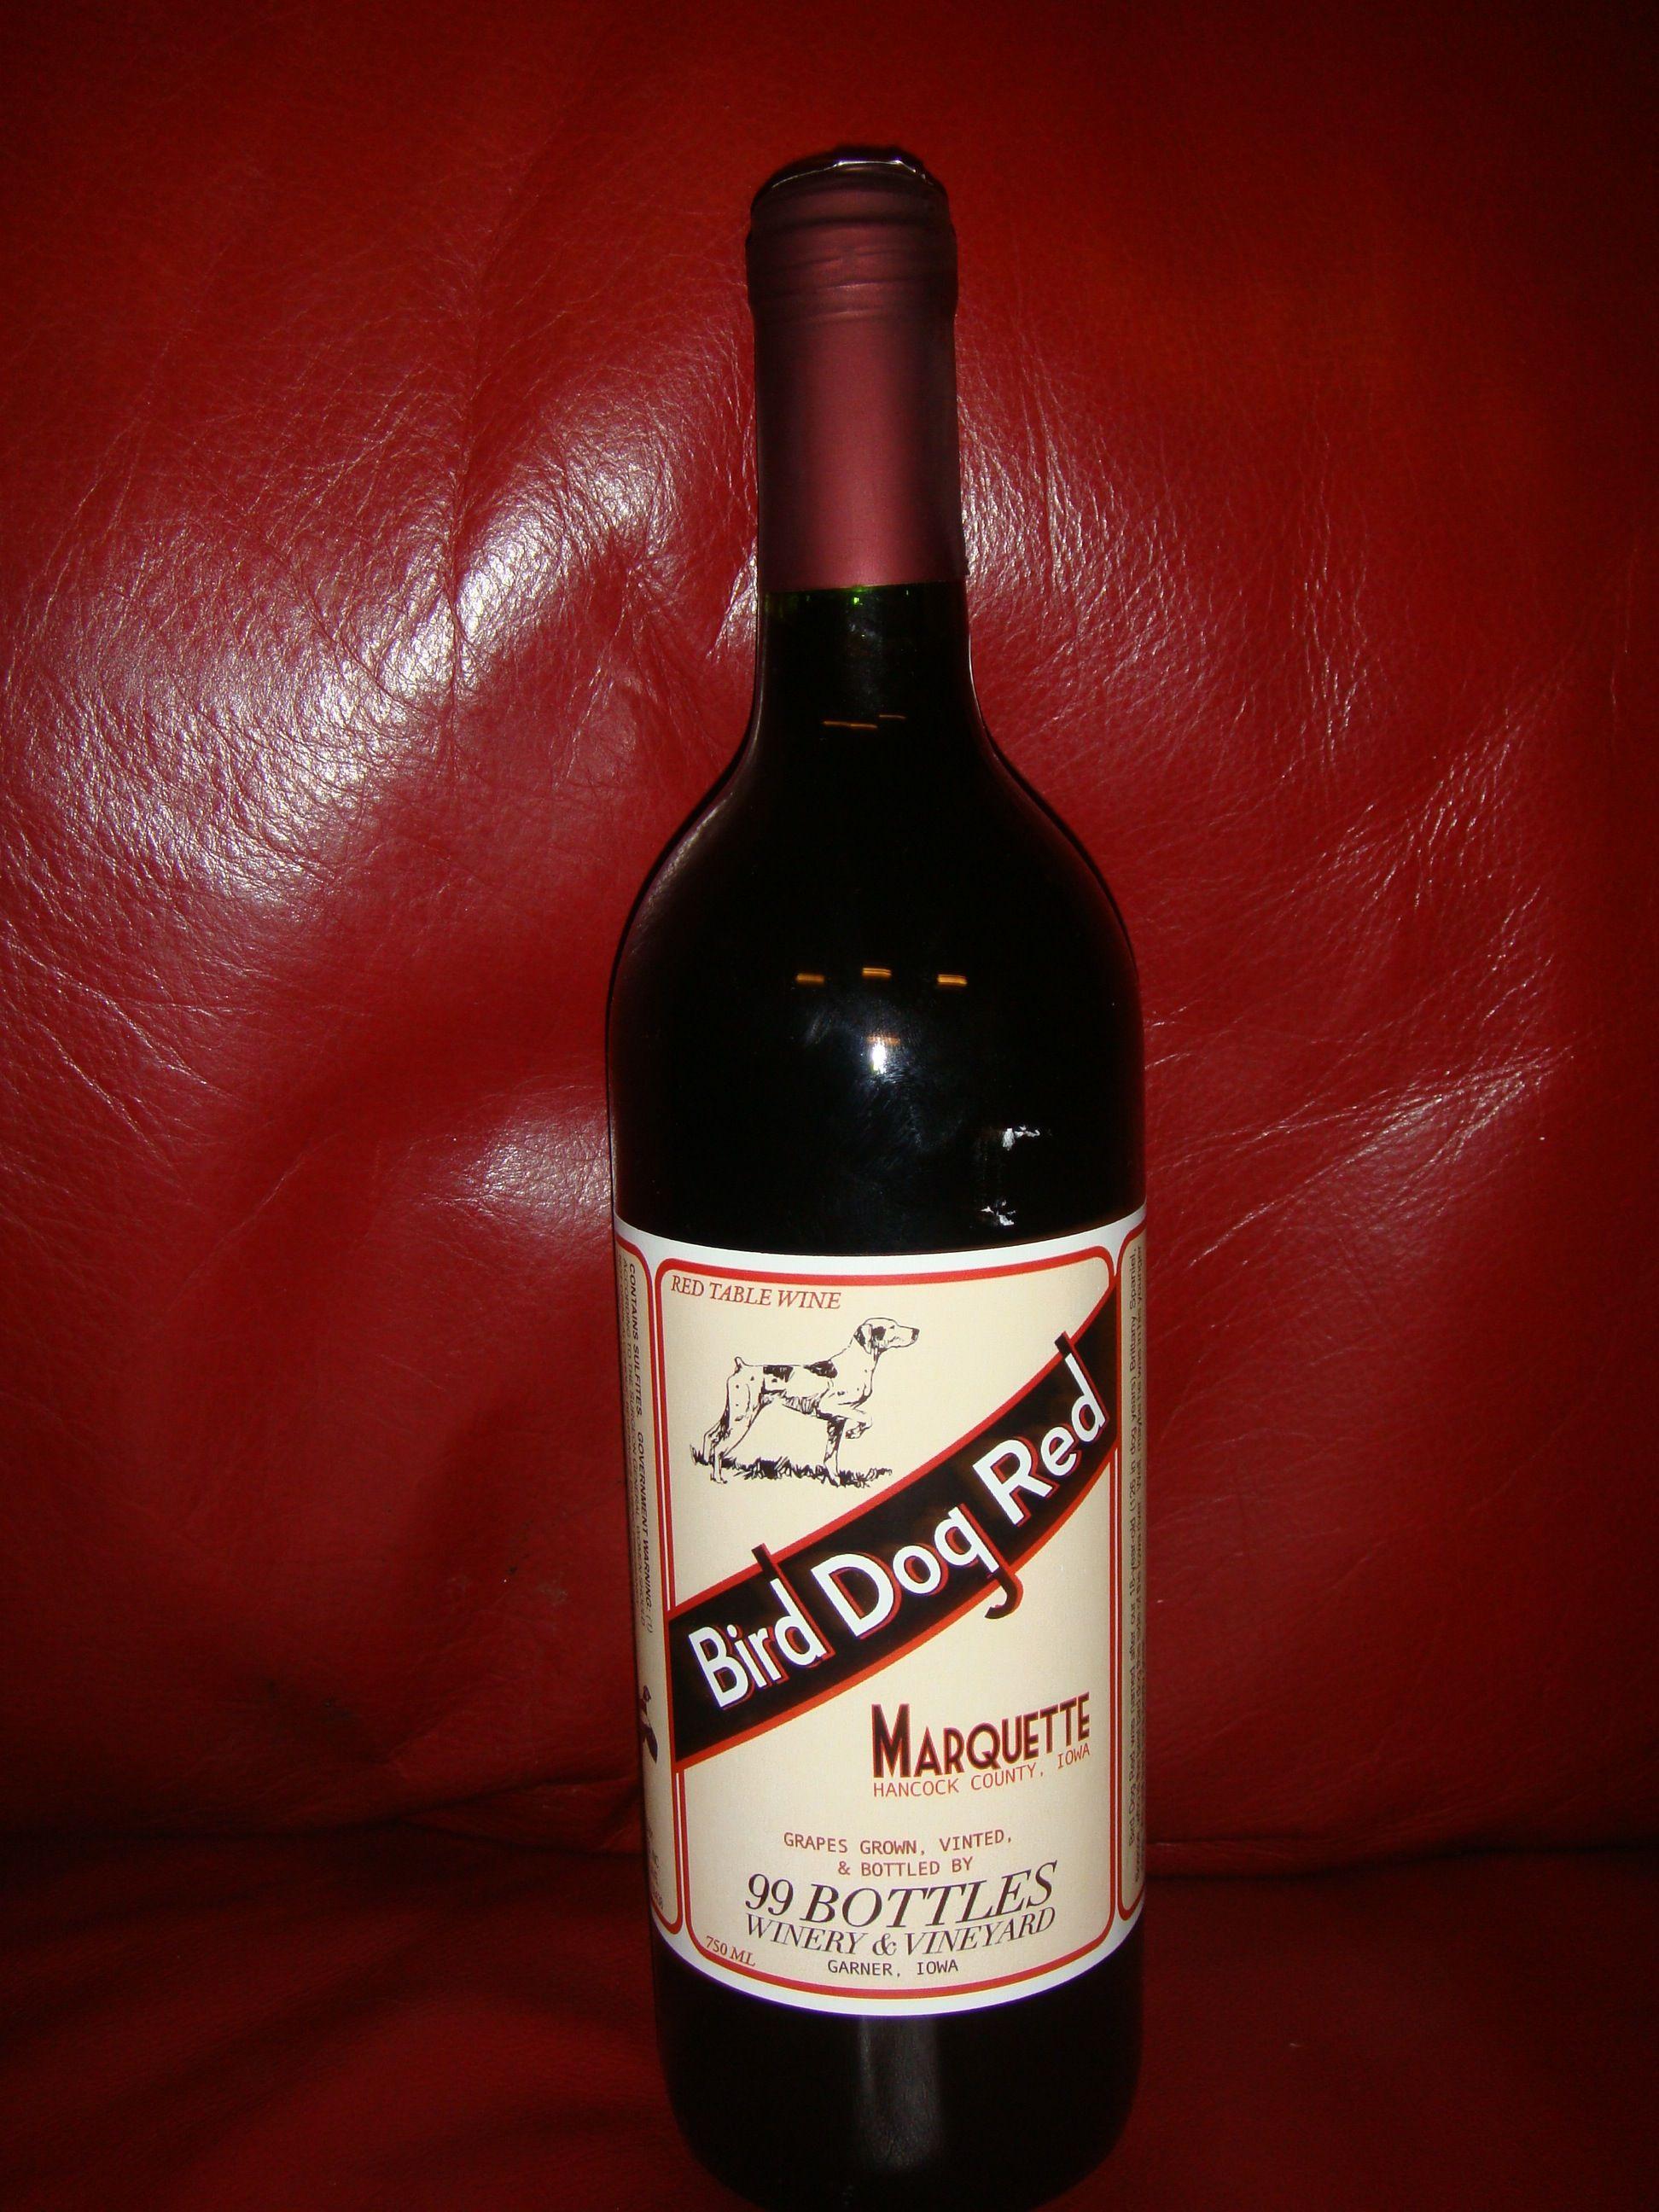 Bird Dog Red Marquette By 99 Bottles Winery Vineyard In Garner Iowa Wine Bottle Bottle Winery